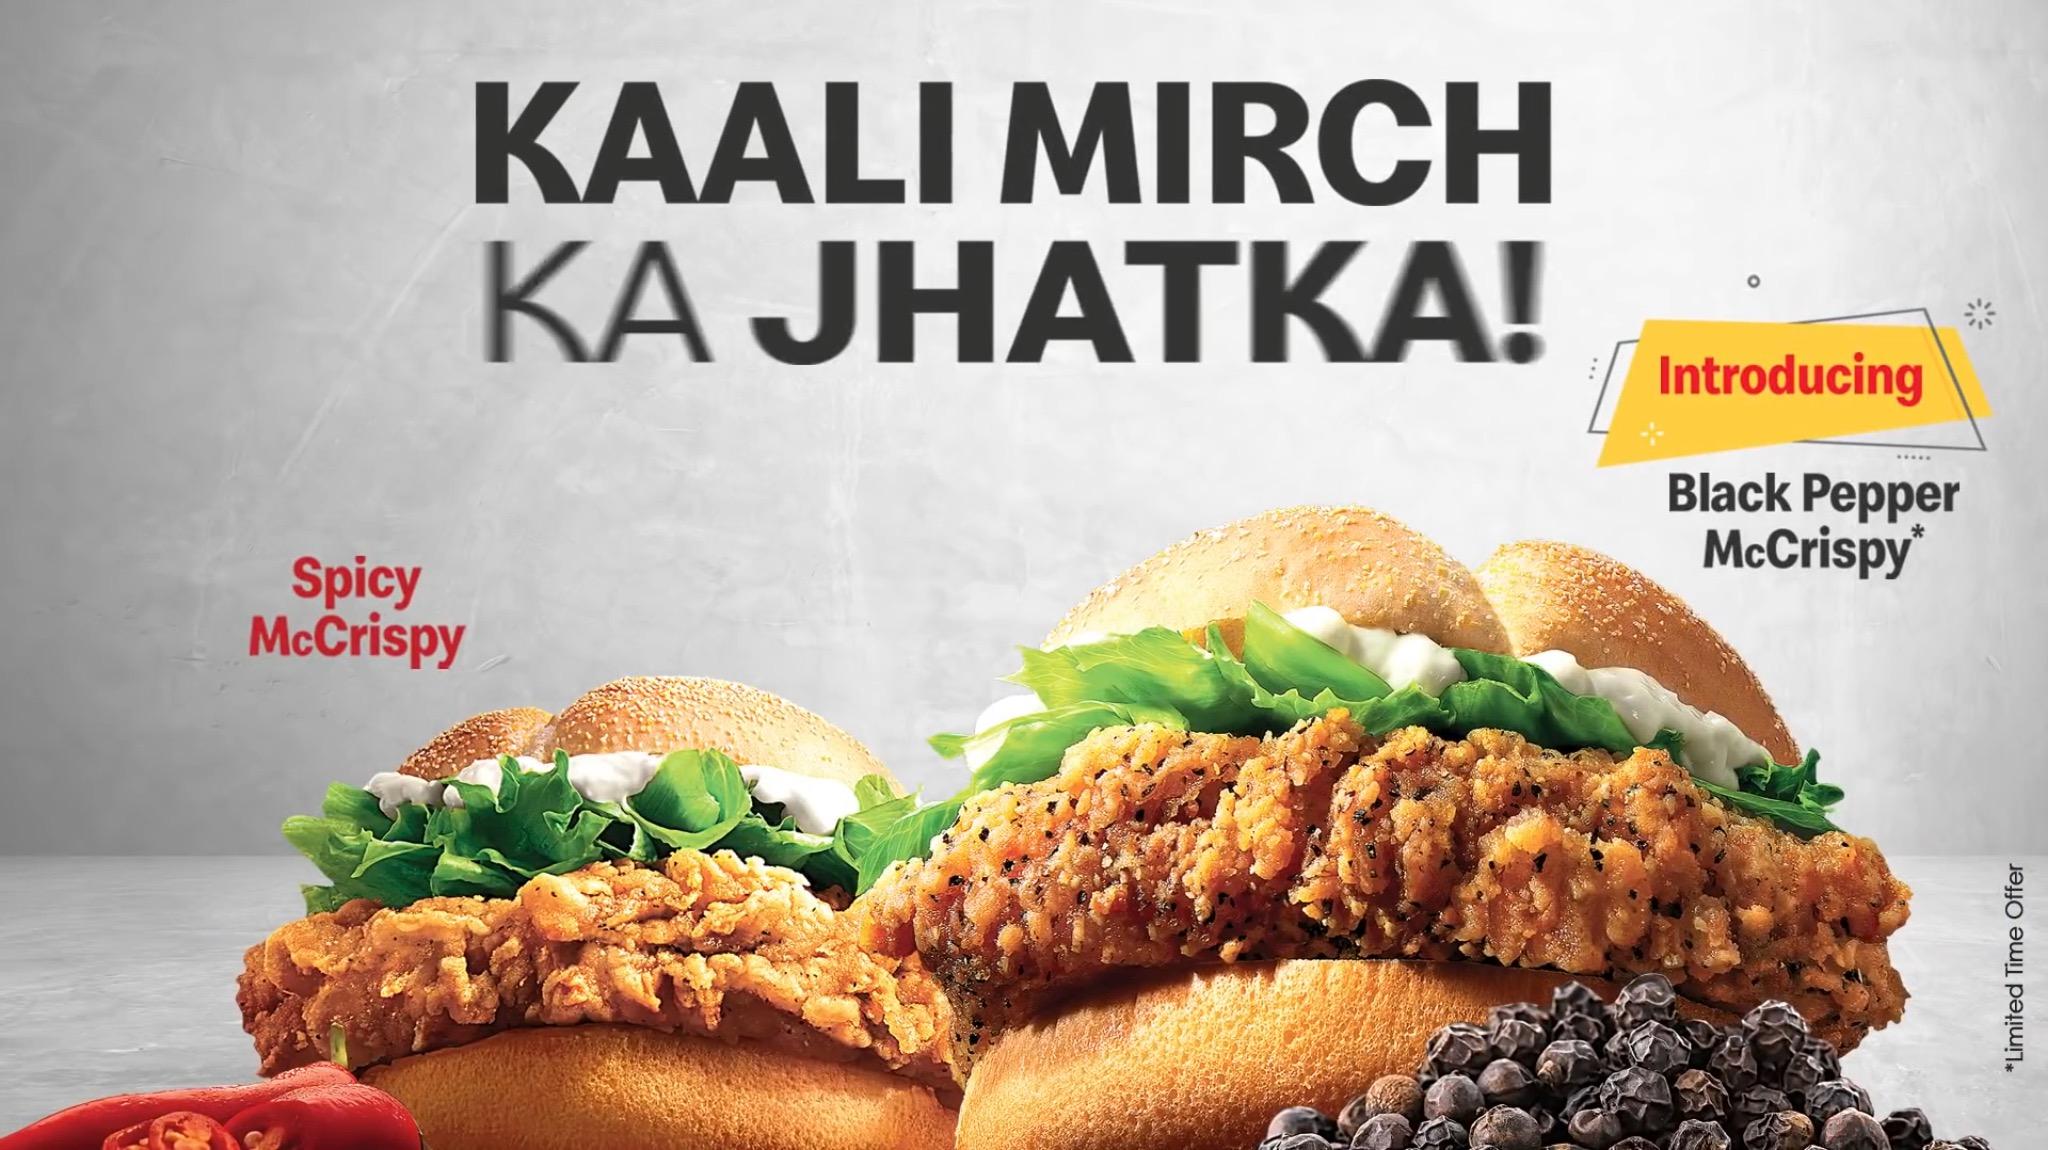 McDonald's Pakistan - Black Pepper McCrispy